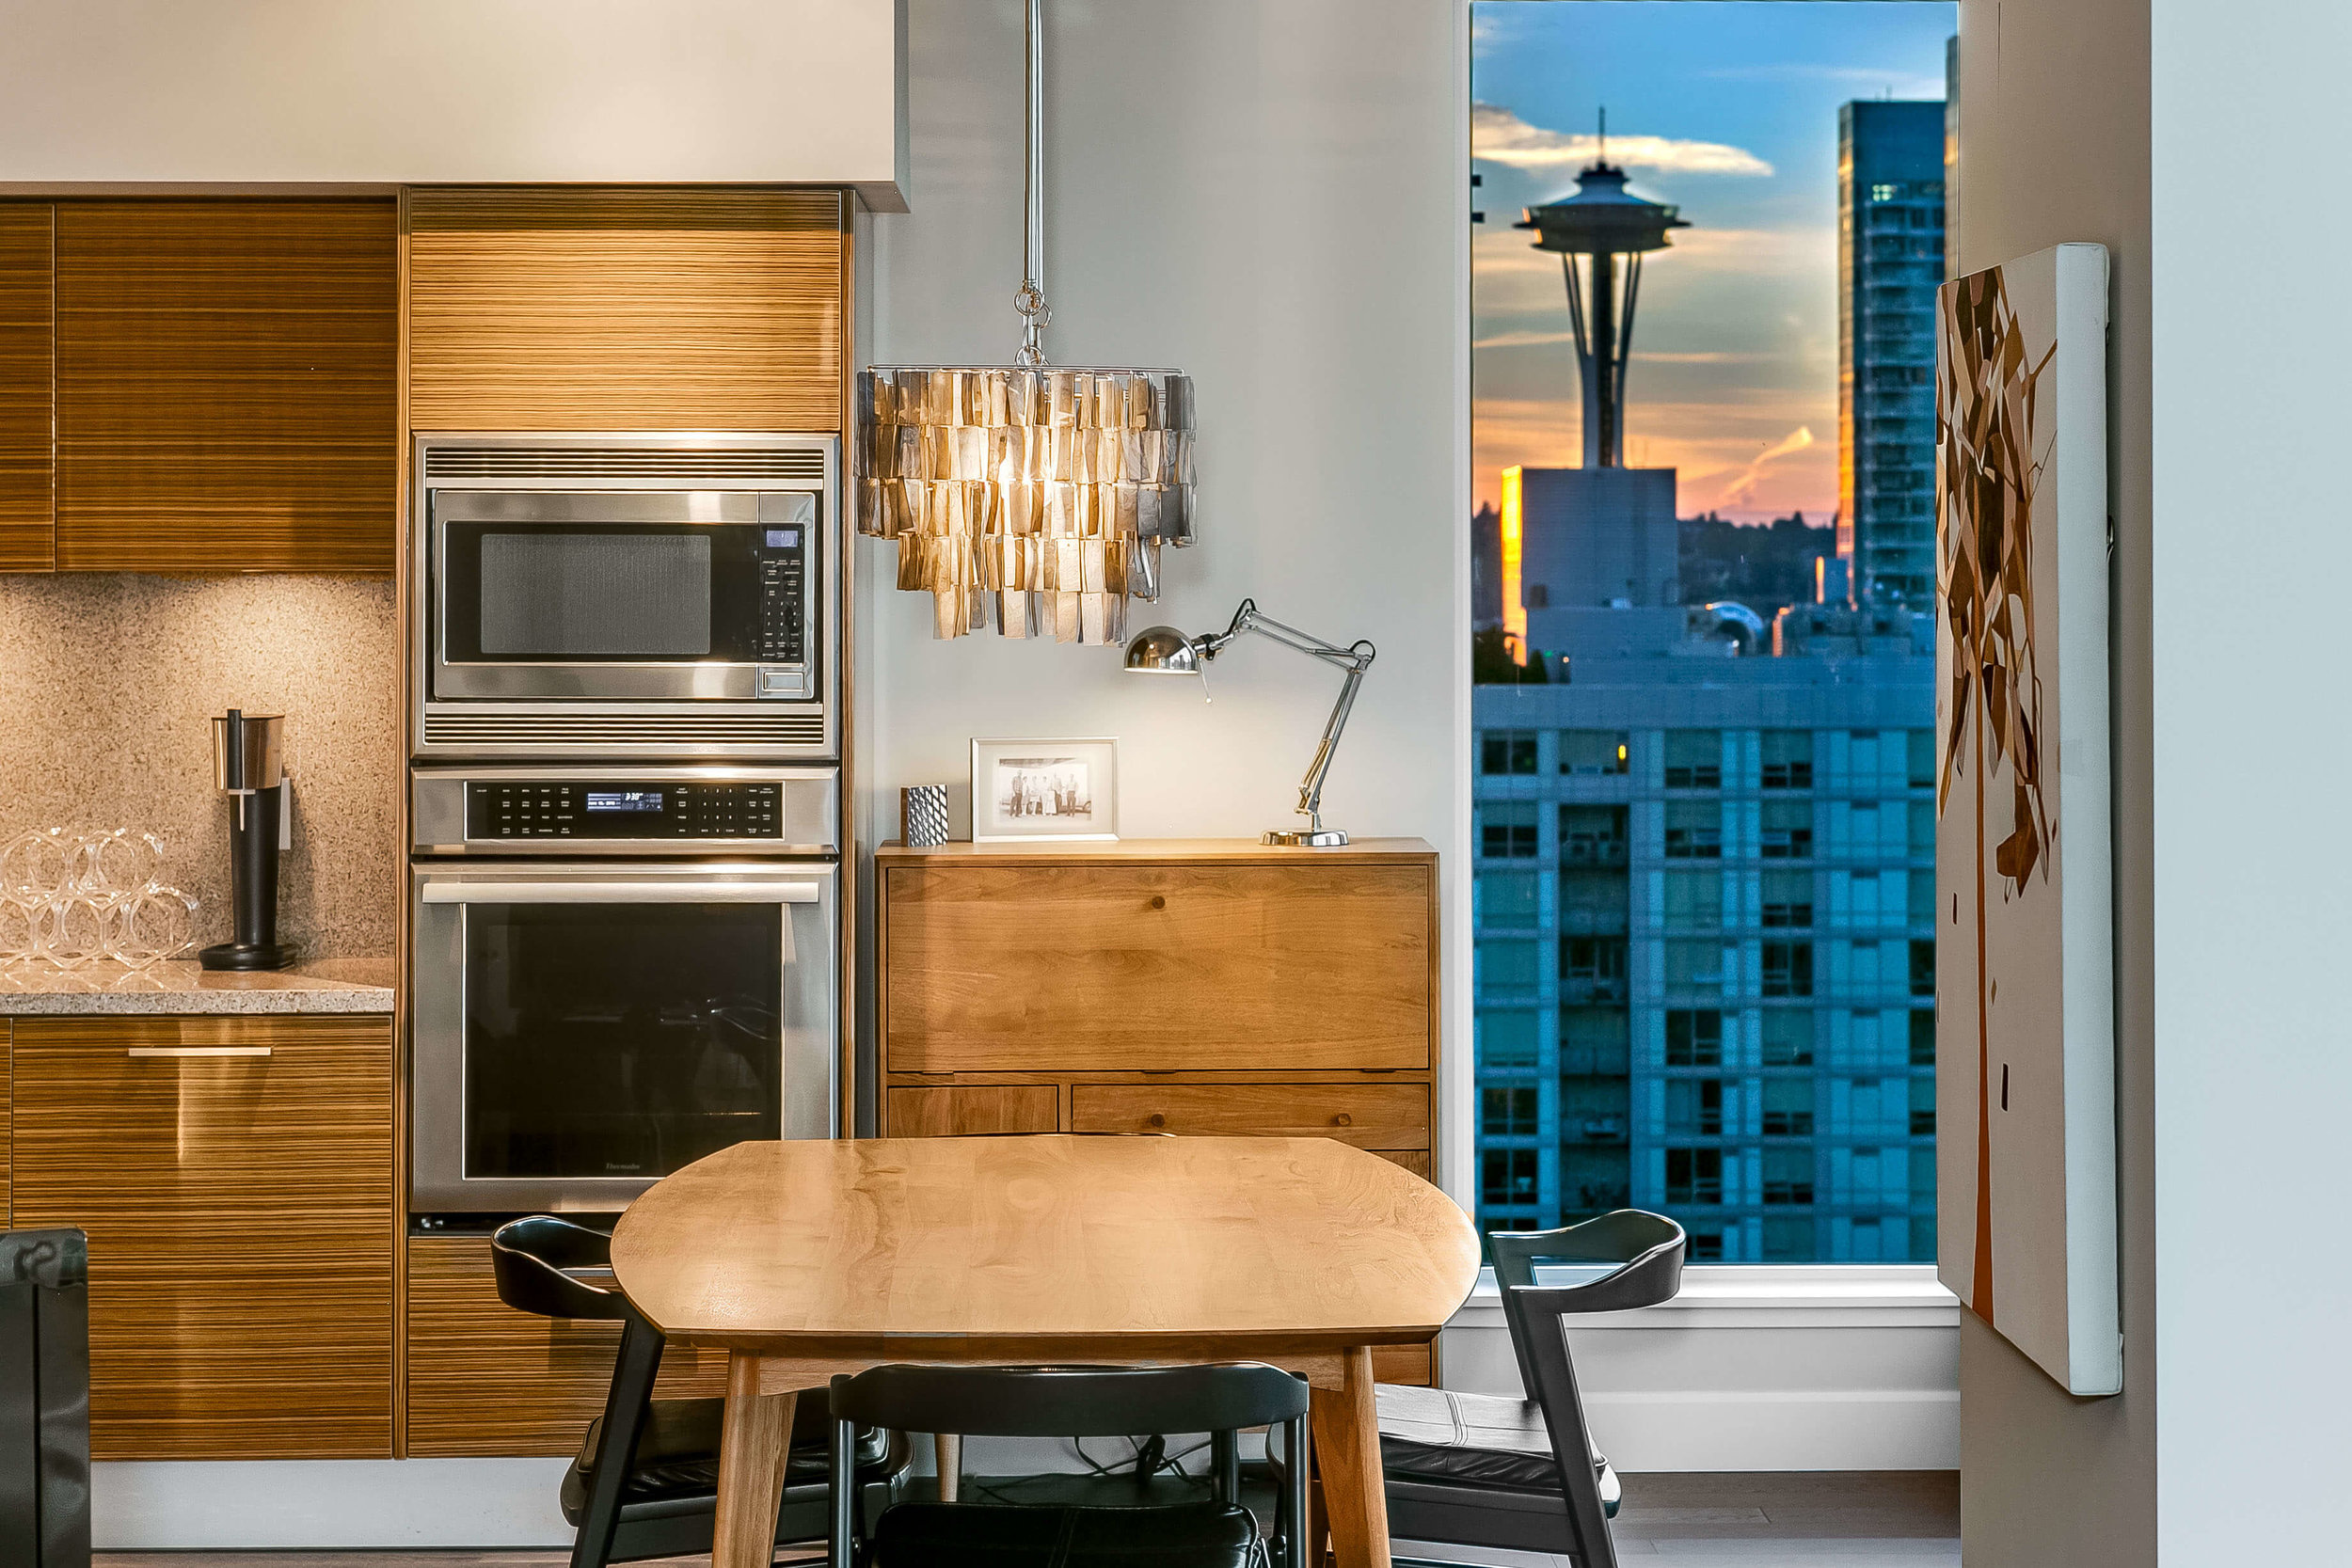 1920-4th-Ave-2406-Seattle-Washington-98101_space-needle-views 2.jpg